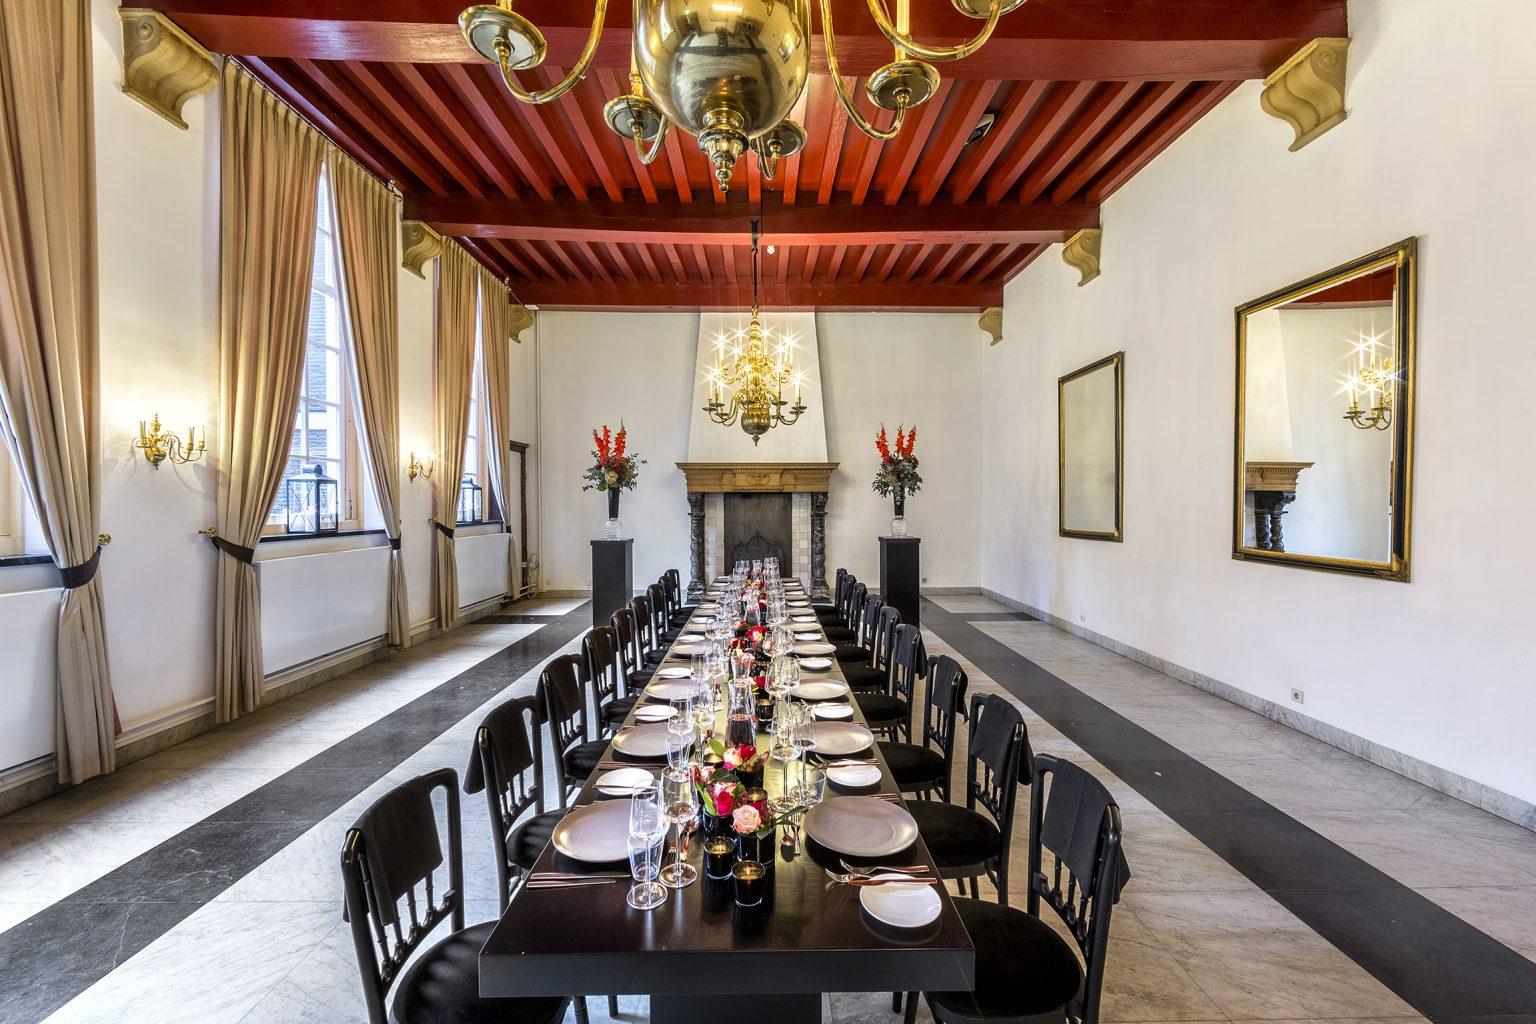 Amsterdam; Floradesigners; West Indisch Huis; vd Kroft Party Rental; Cojan van Toor Professional Photography; Oudewater